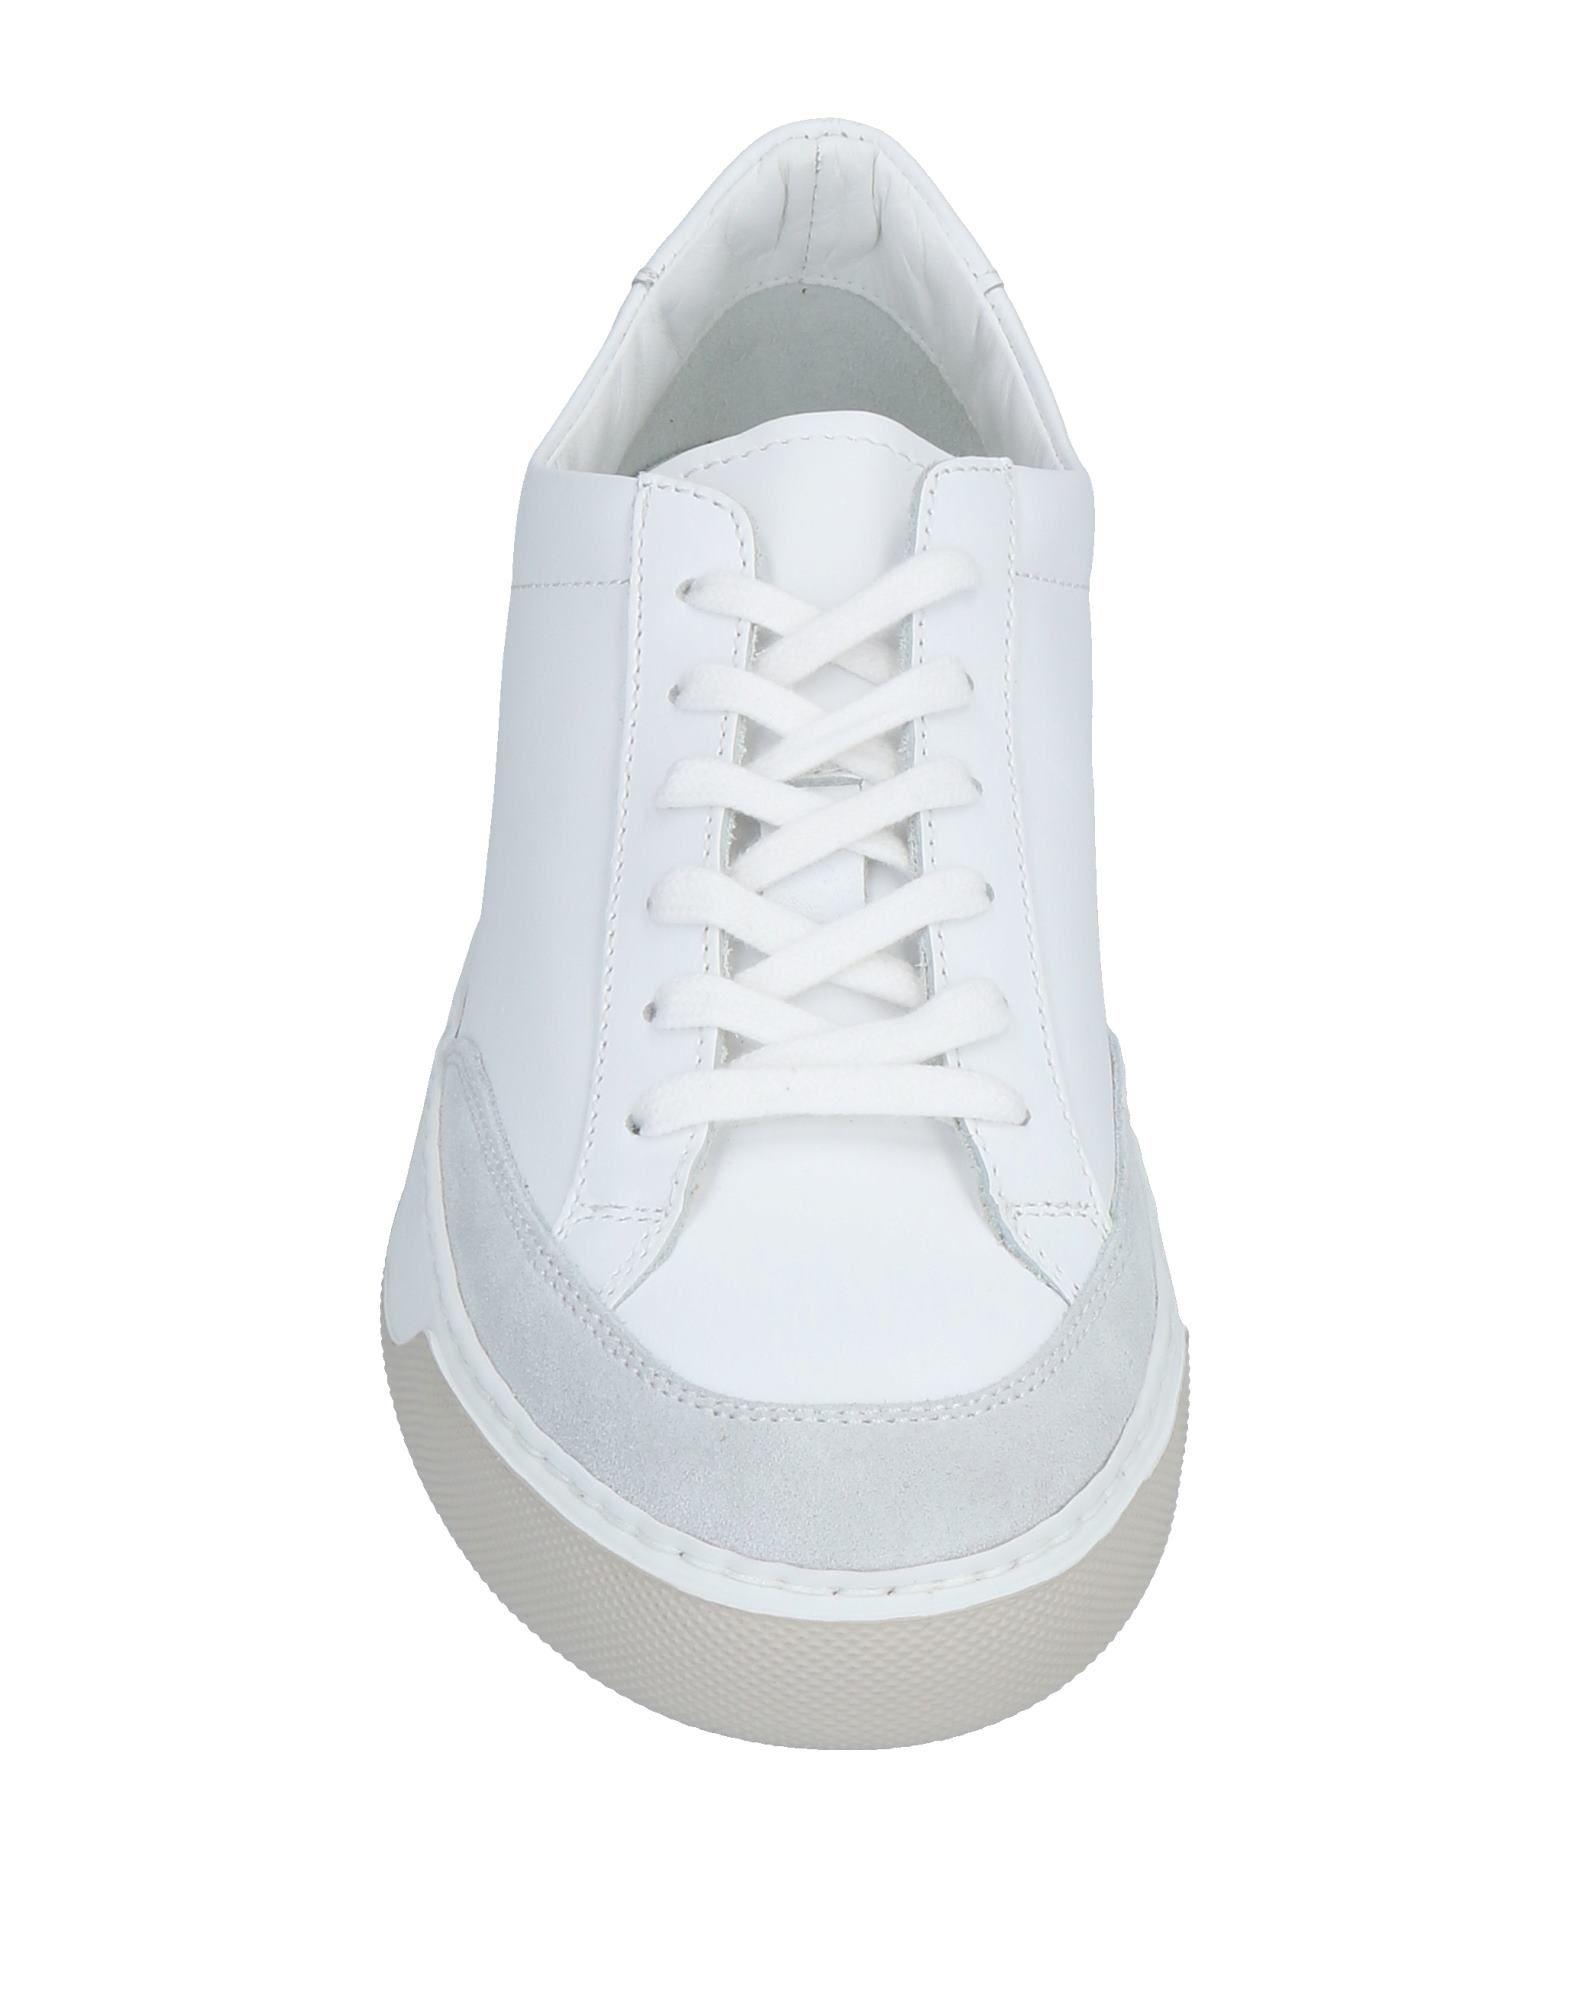 Rabatt Schuhe Woman By Common 11480880QP Projects Sneakers Damen  11480880QP Common 469302